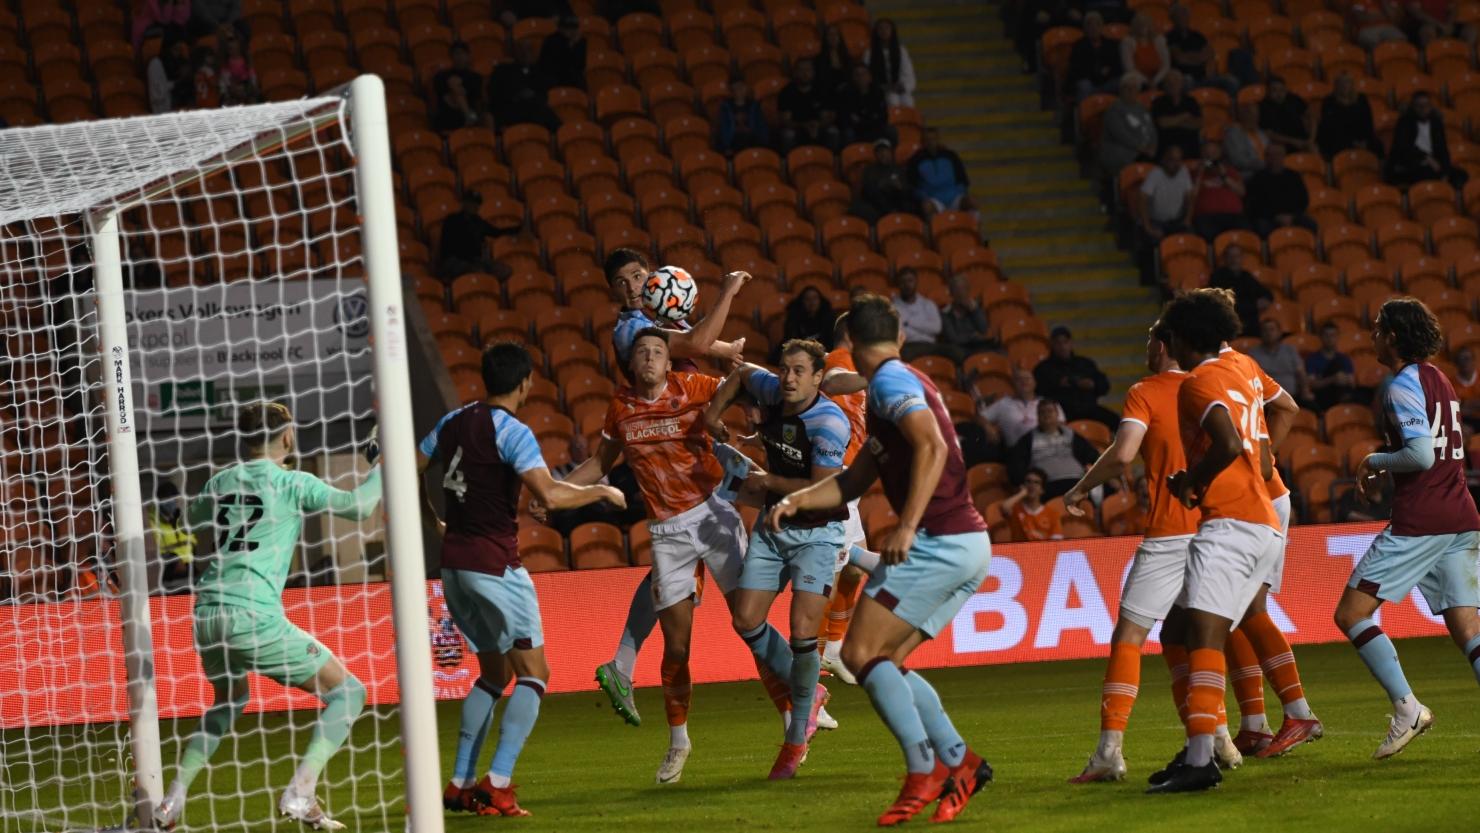 Report: Blackpool 0 Burnley 1